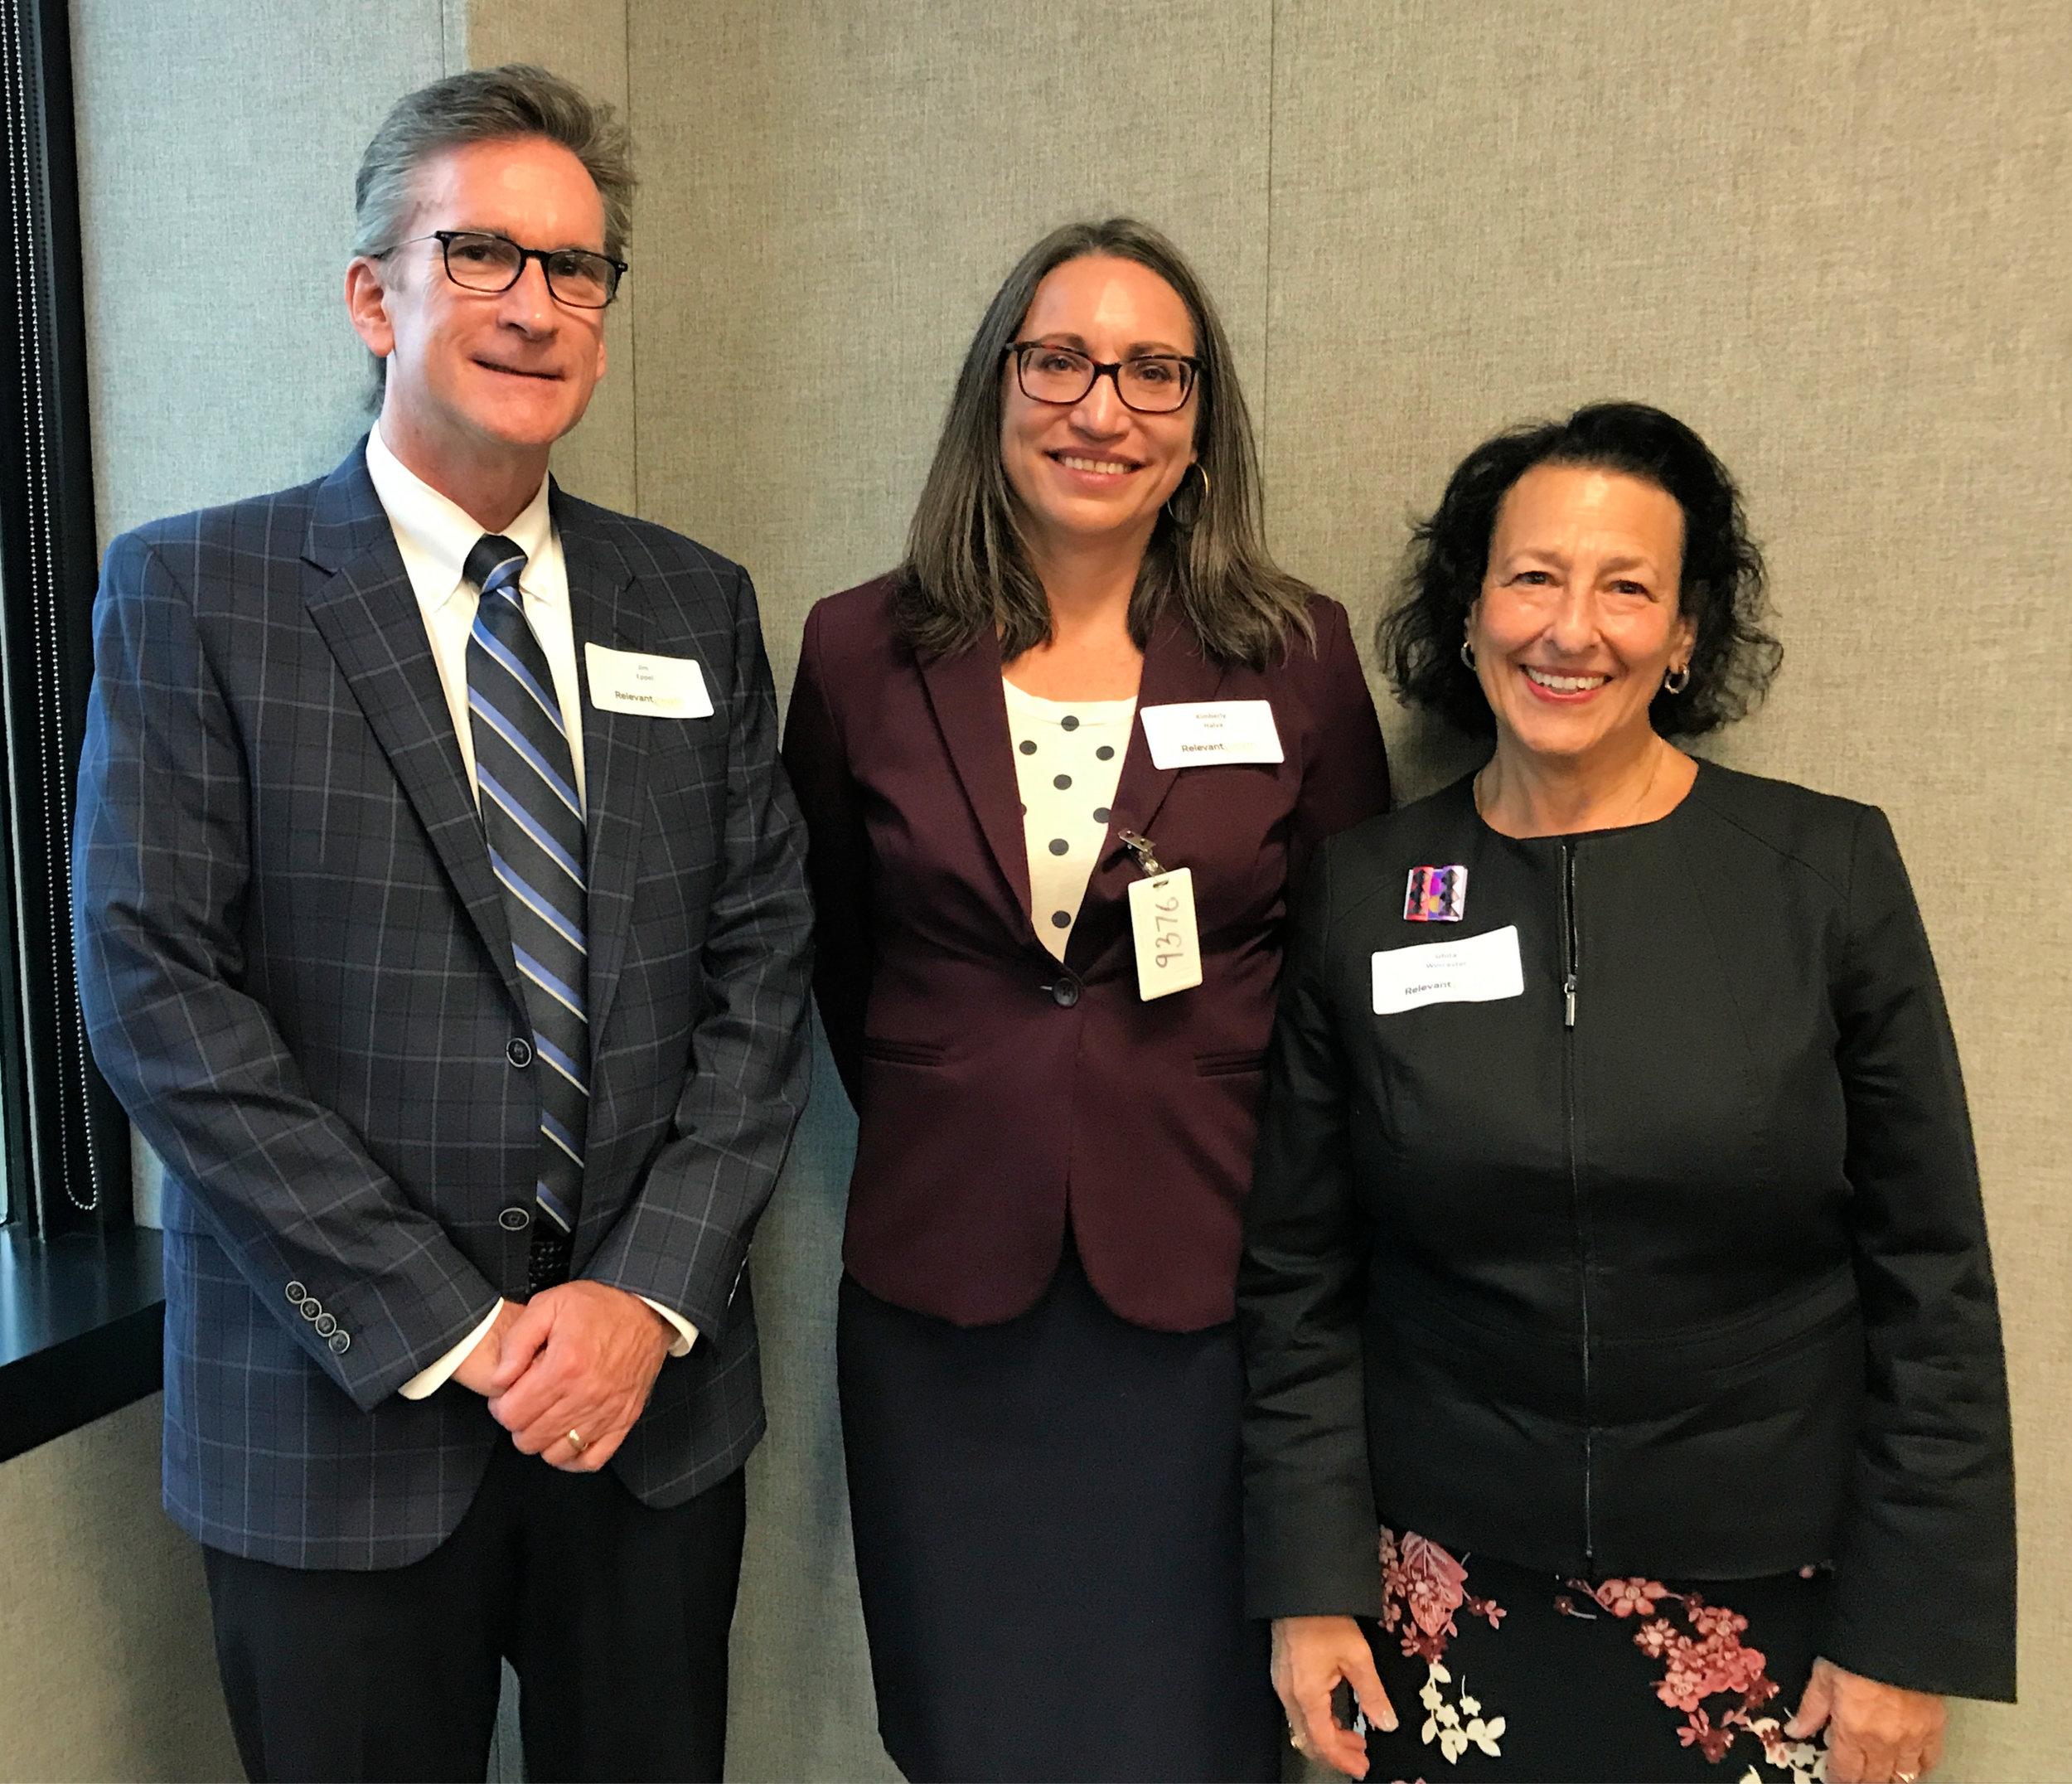 Panelists Jim Eppel, Kimberly Halva, and Ghita Worcester